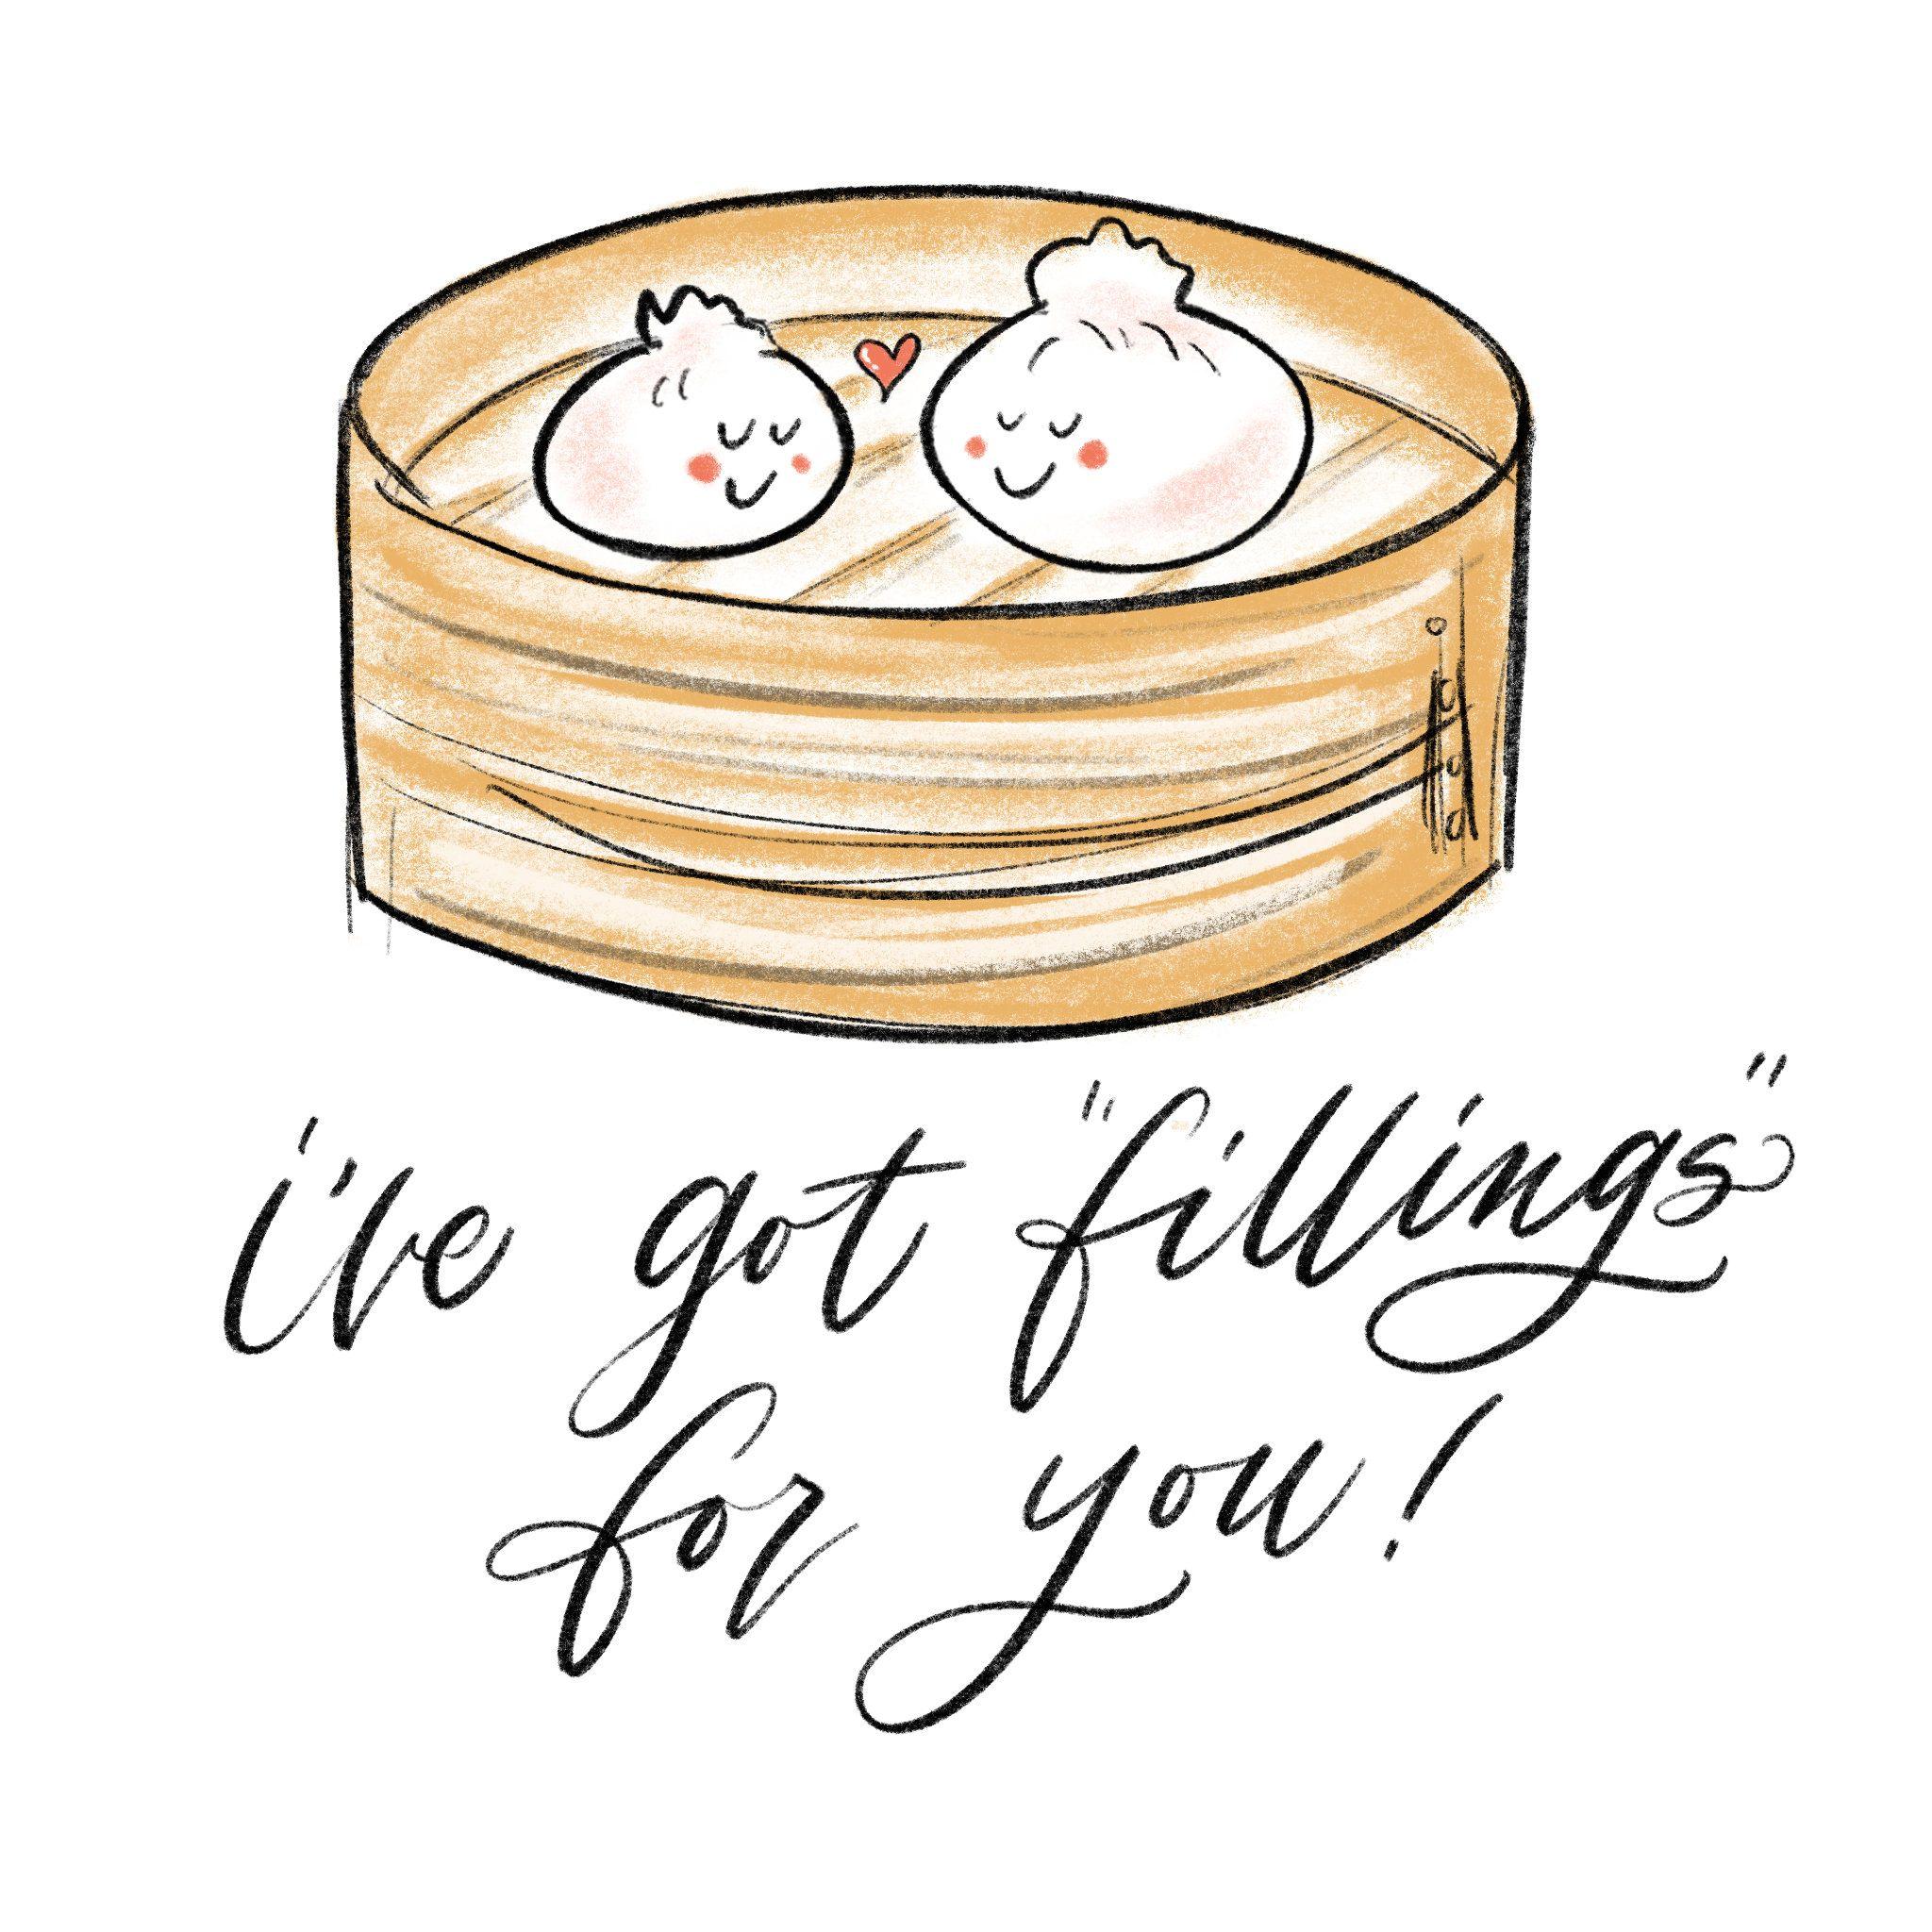 I Ve Got Fillings For You Dim Sum Dumplings Baos Food Pun Card Valentines Love Card Hand Lettering Calligraphy Cute Illustration Pun Card Valentine Love Cards Food Puns